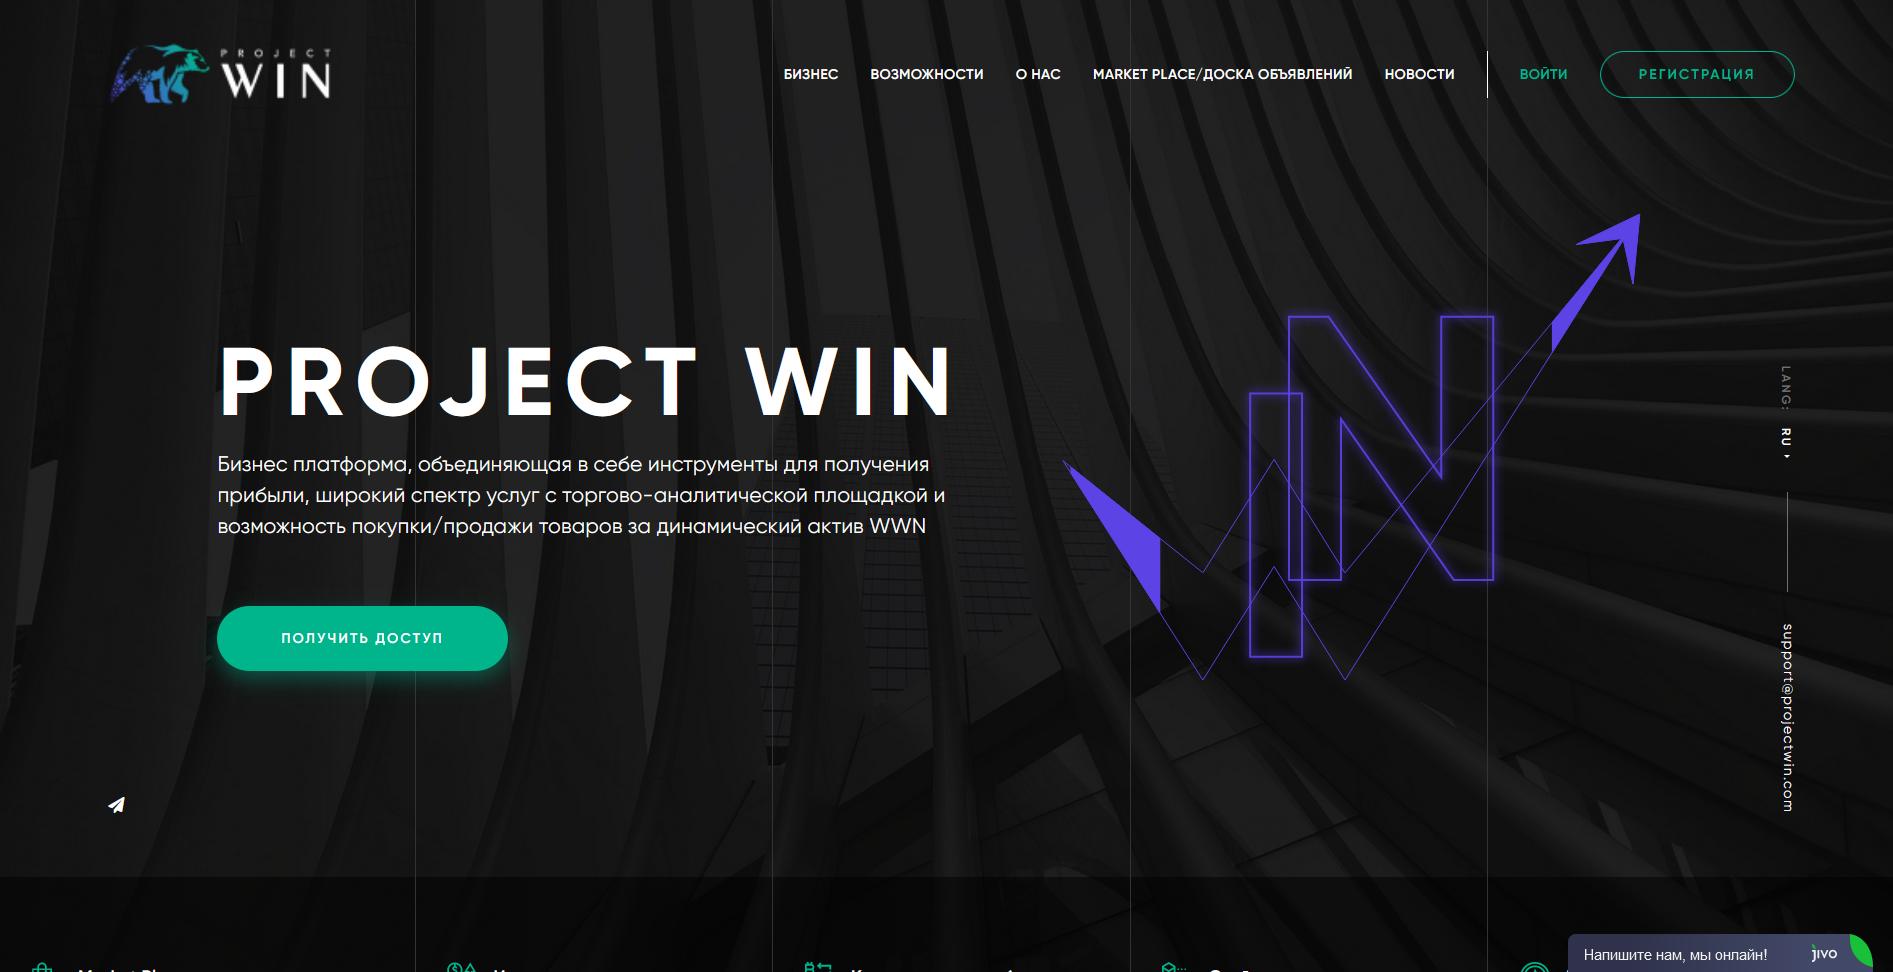 Project Win - projectwin.ru